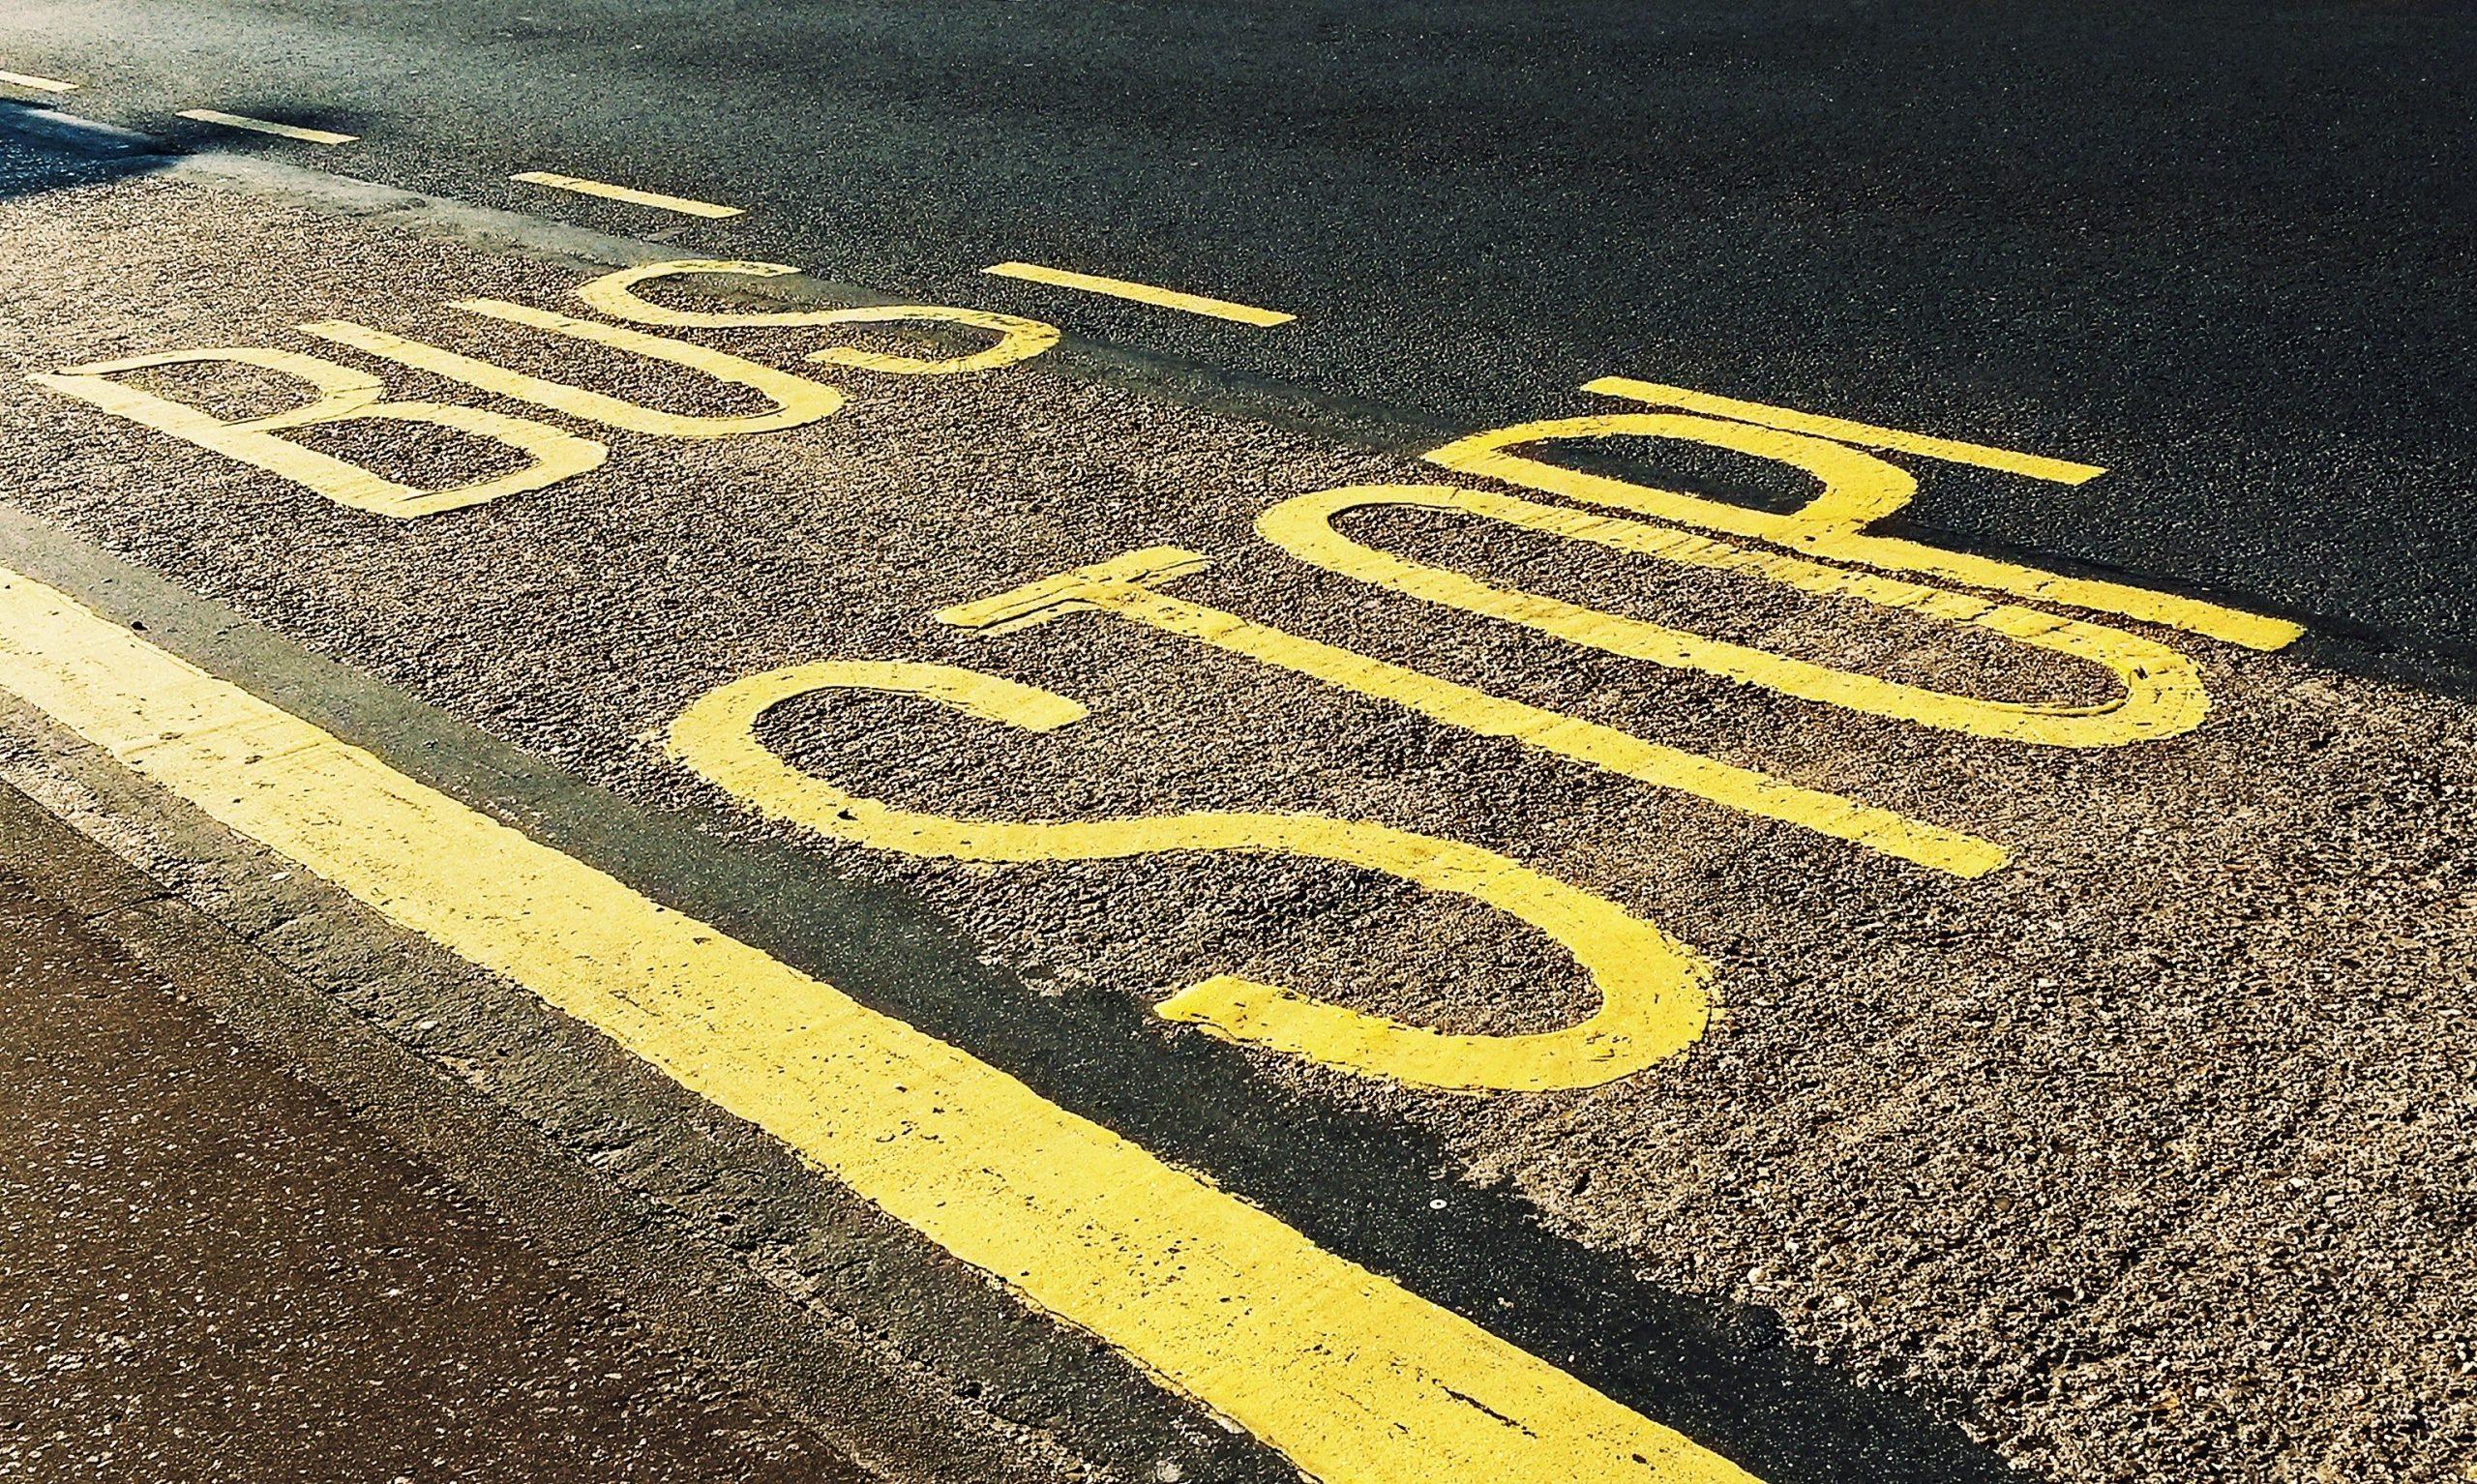 asphalt-bus-stop-close-up-1260437